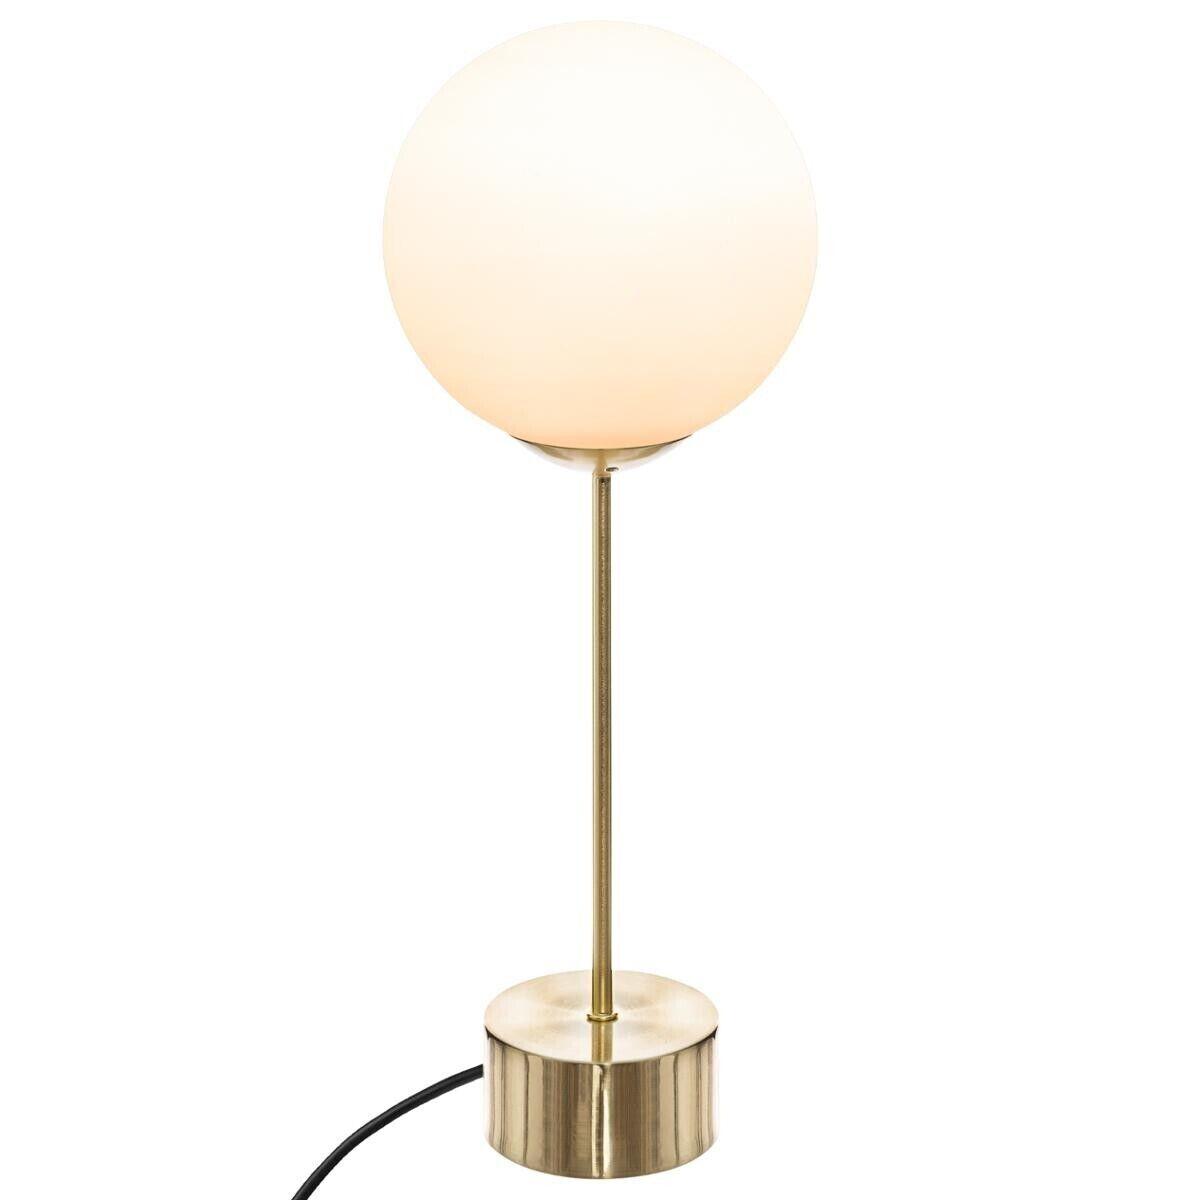 Atmosphera Lampe 'Dris' dorée, métal H43 cm